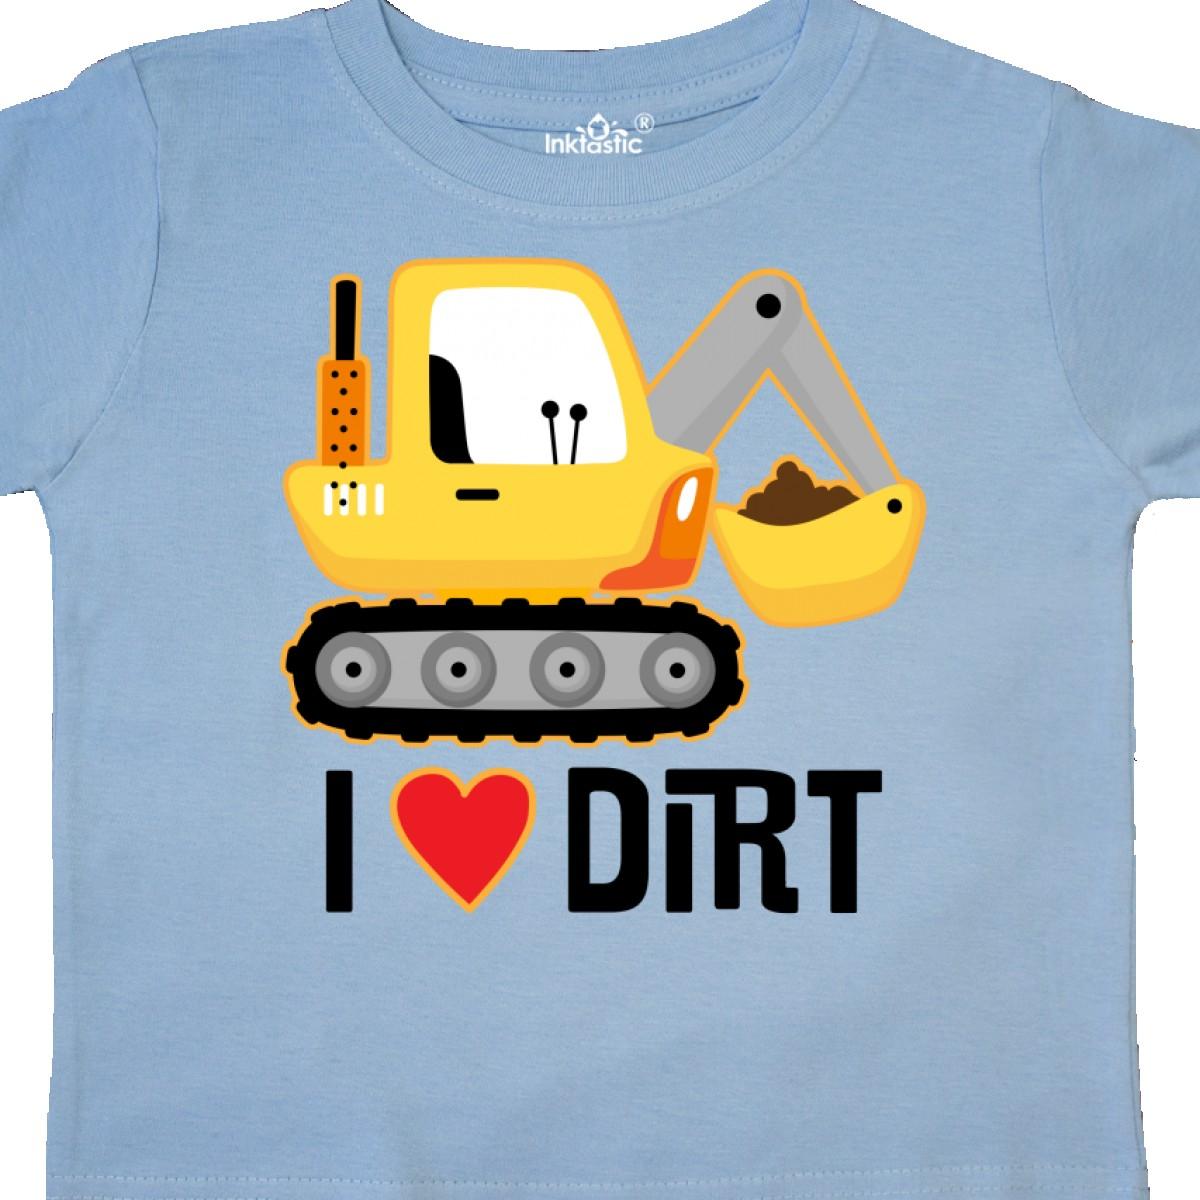 Inktastic Construction Truck I Love Dirt Toddler T-Shirt Digger Boys Childs Toys